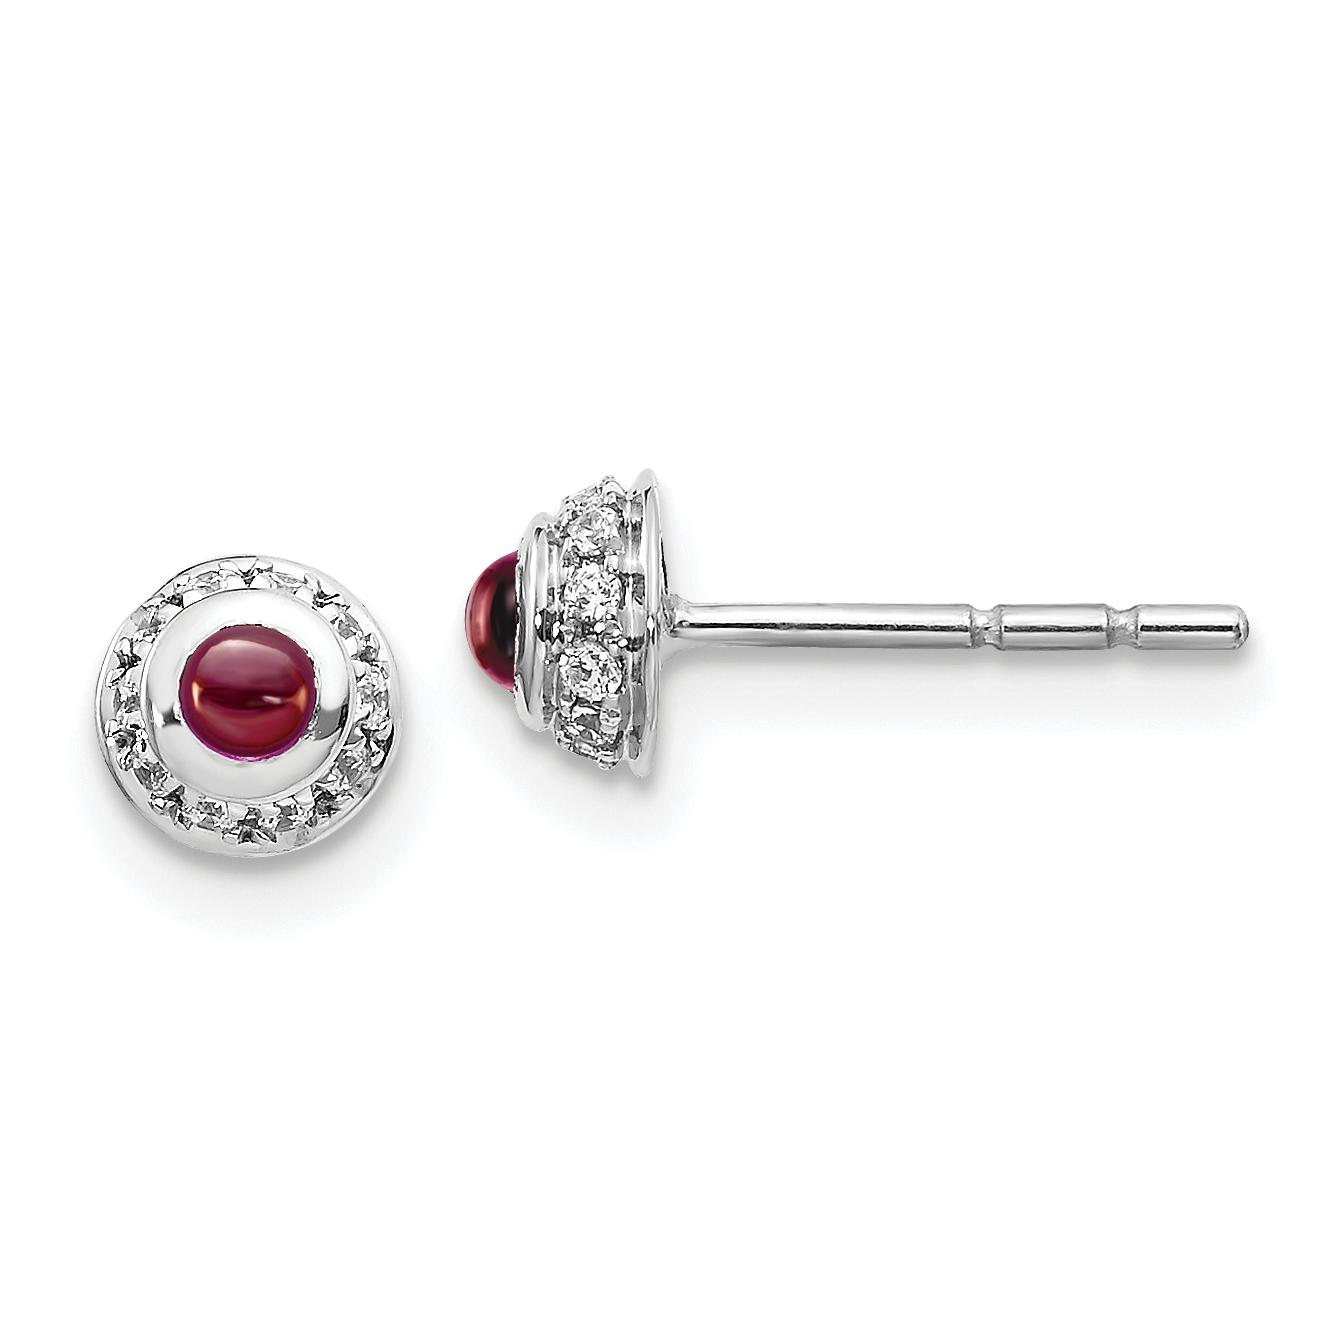 Bezel set Garnet Stud Earrings with Diamond accents, 14k White Gold